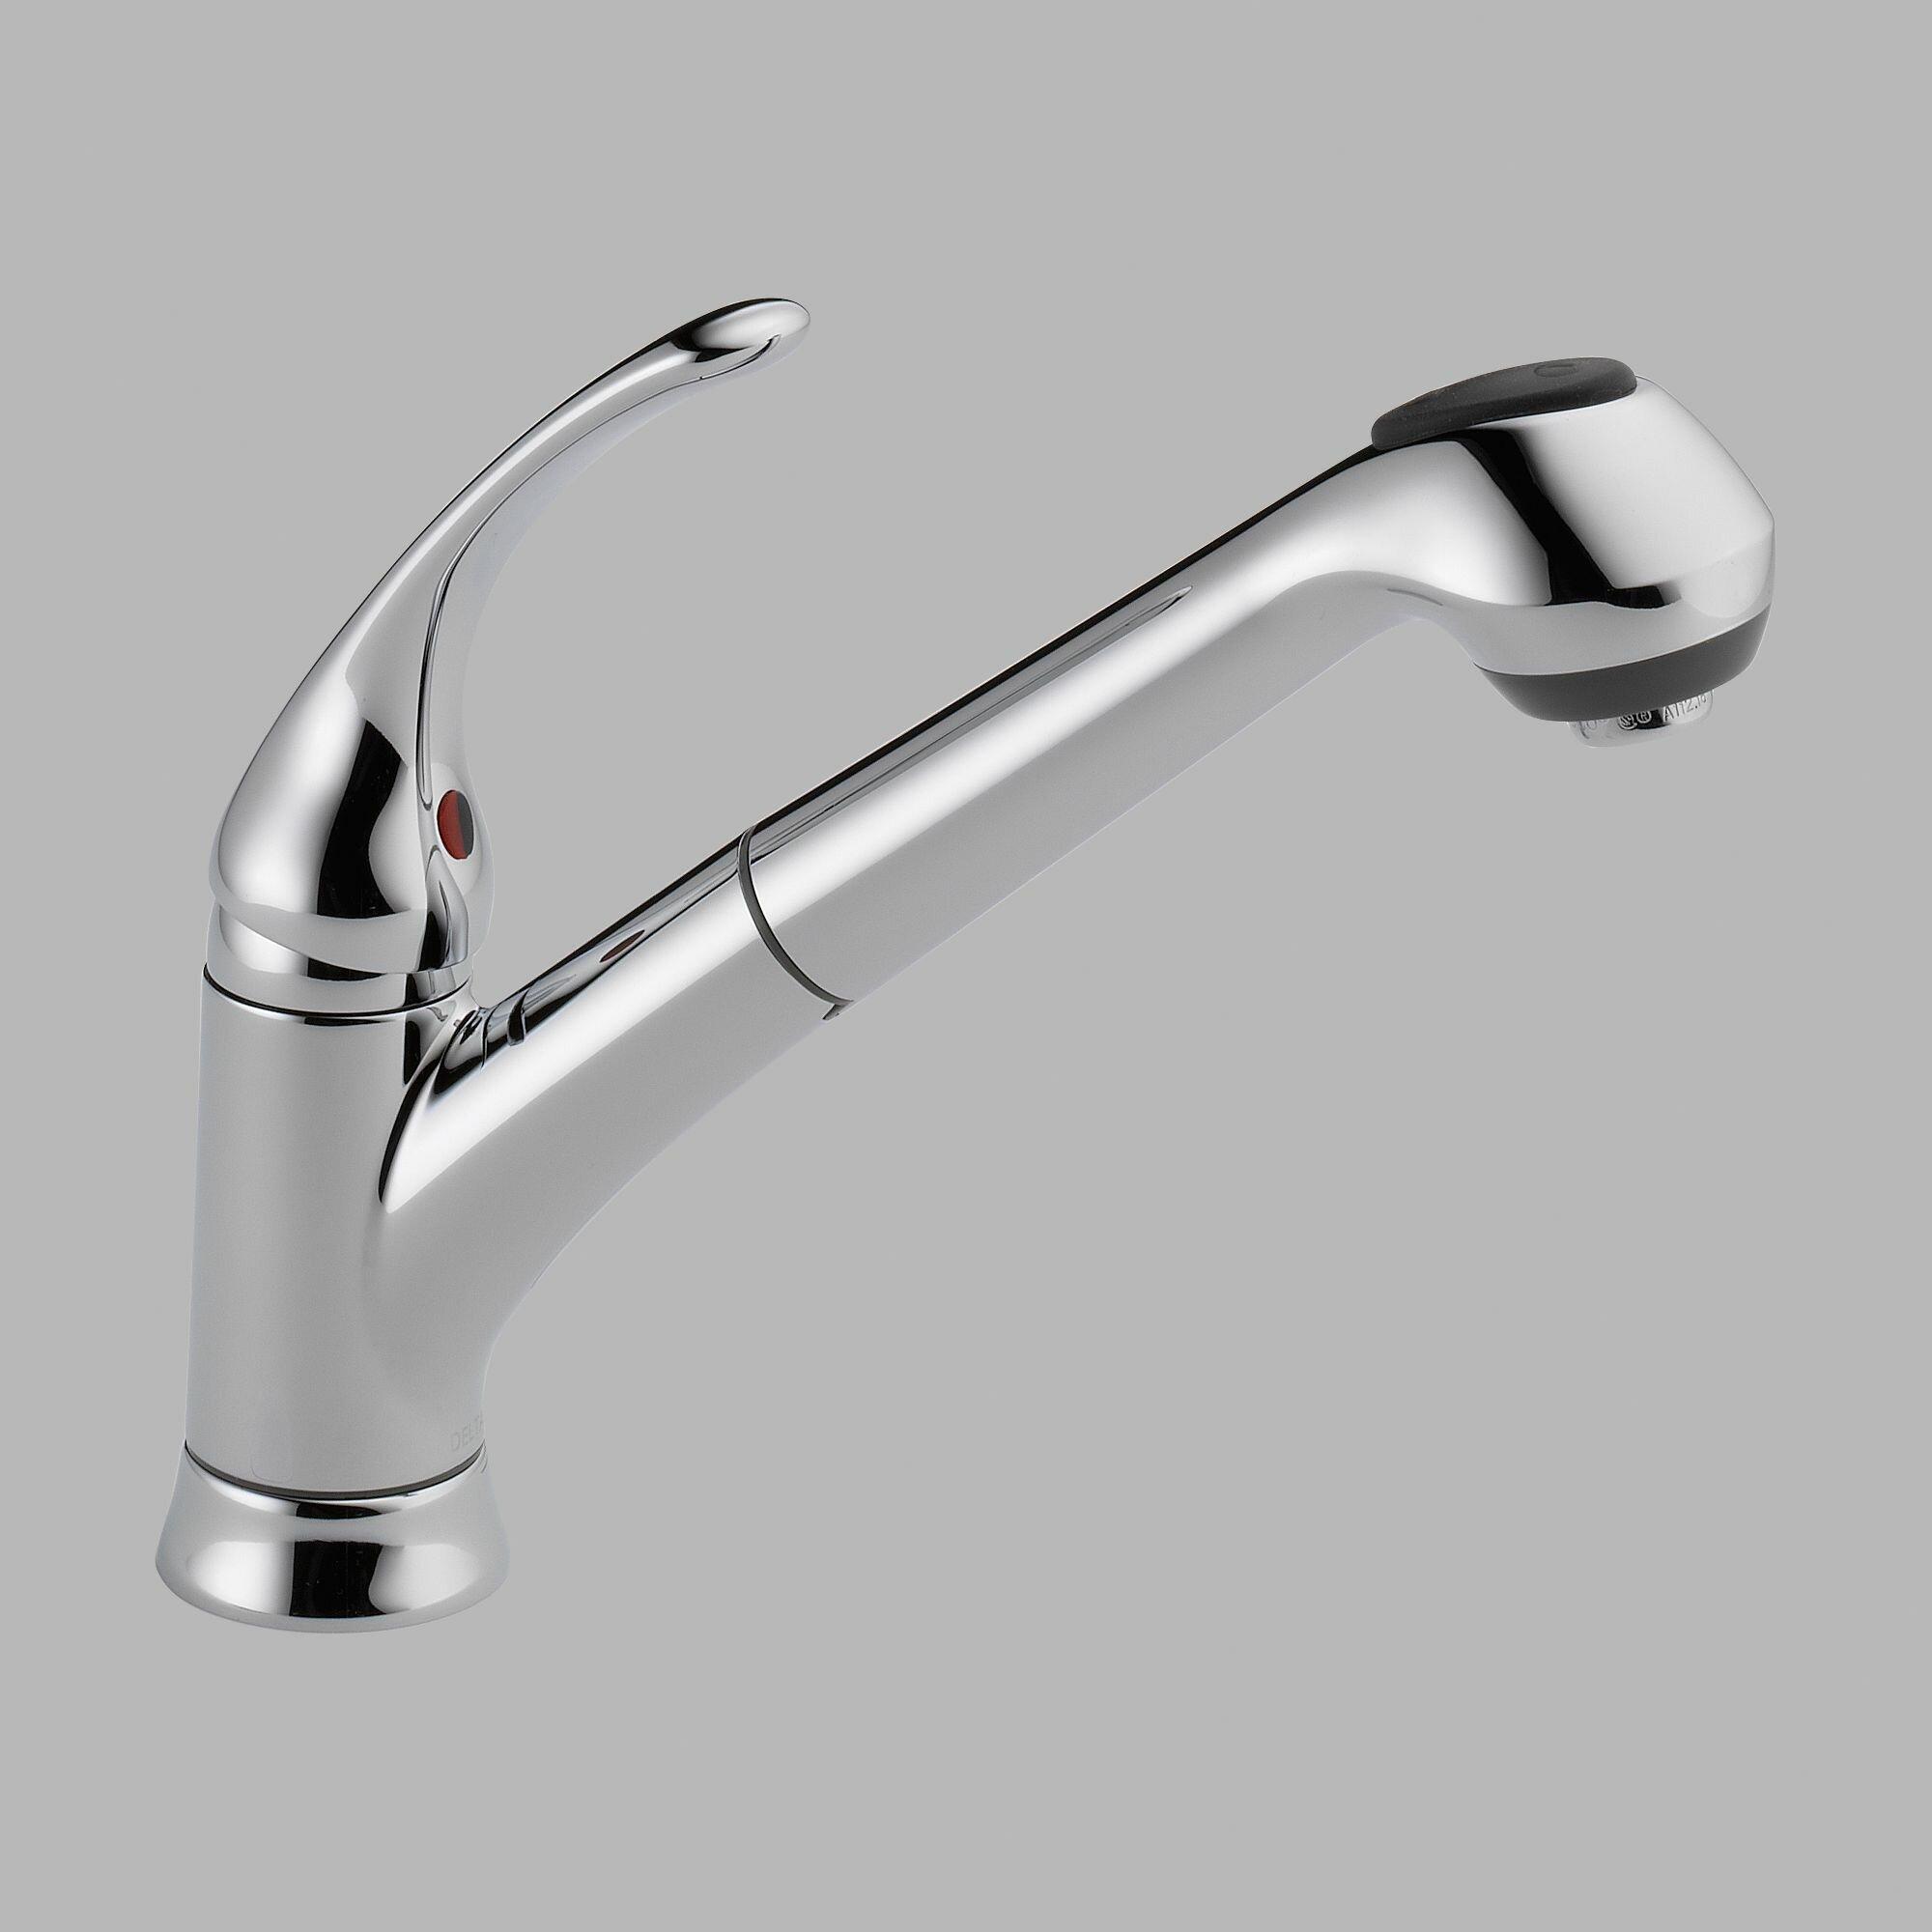 Delta Kitchen Sink Faucets Delta Foundations Single Handle Deck Mounted Kitchen Faucet